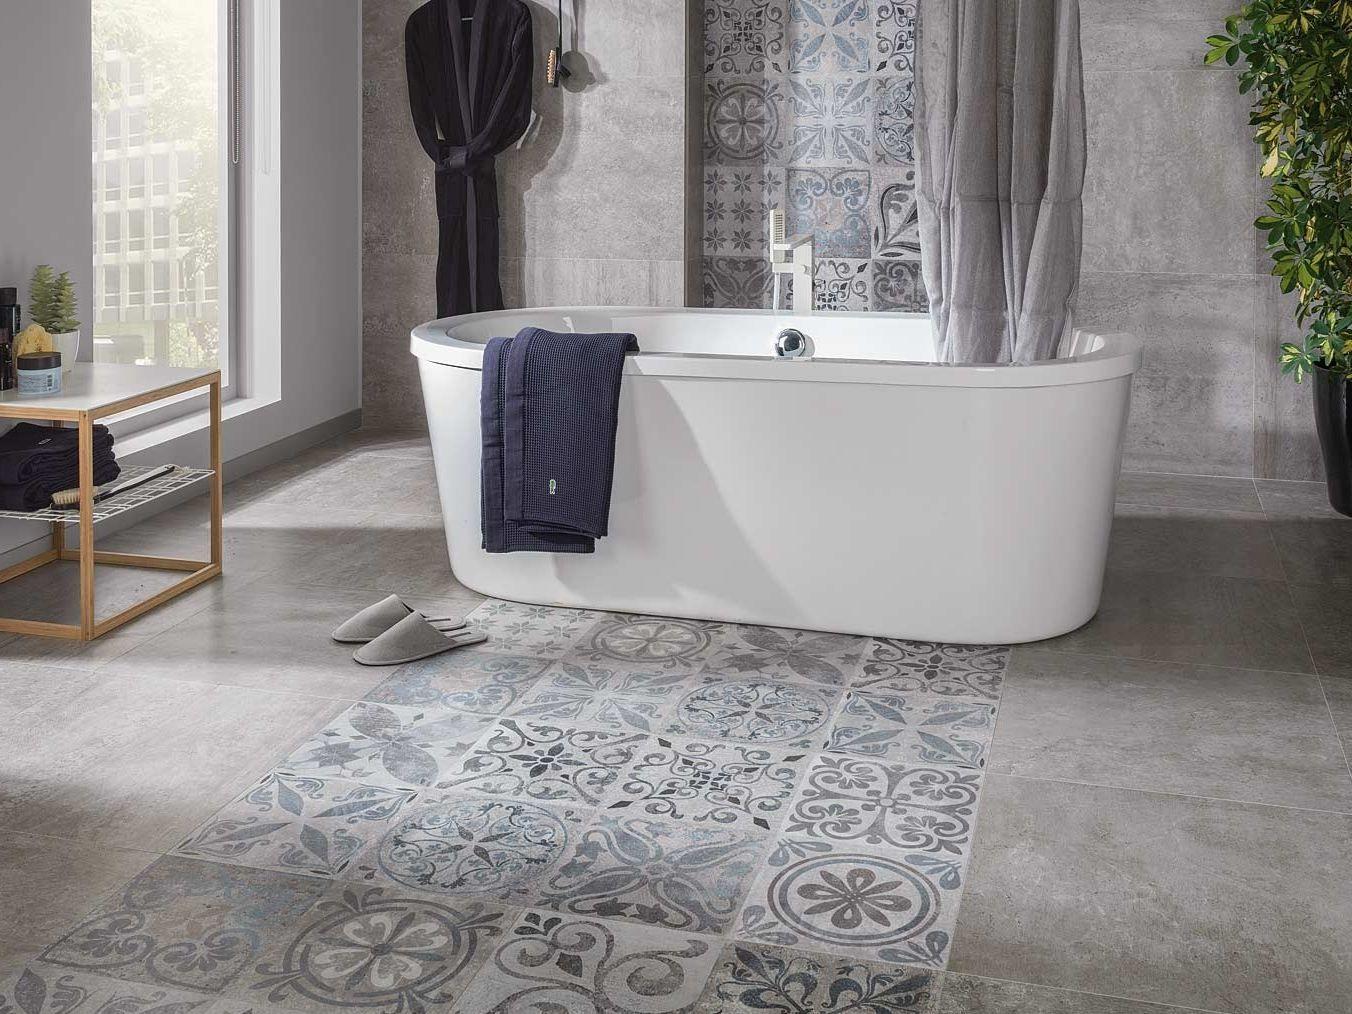 Wall floor tiles ston ker antique by porcelanosa - Fliesen bottrop ...